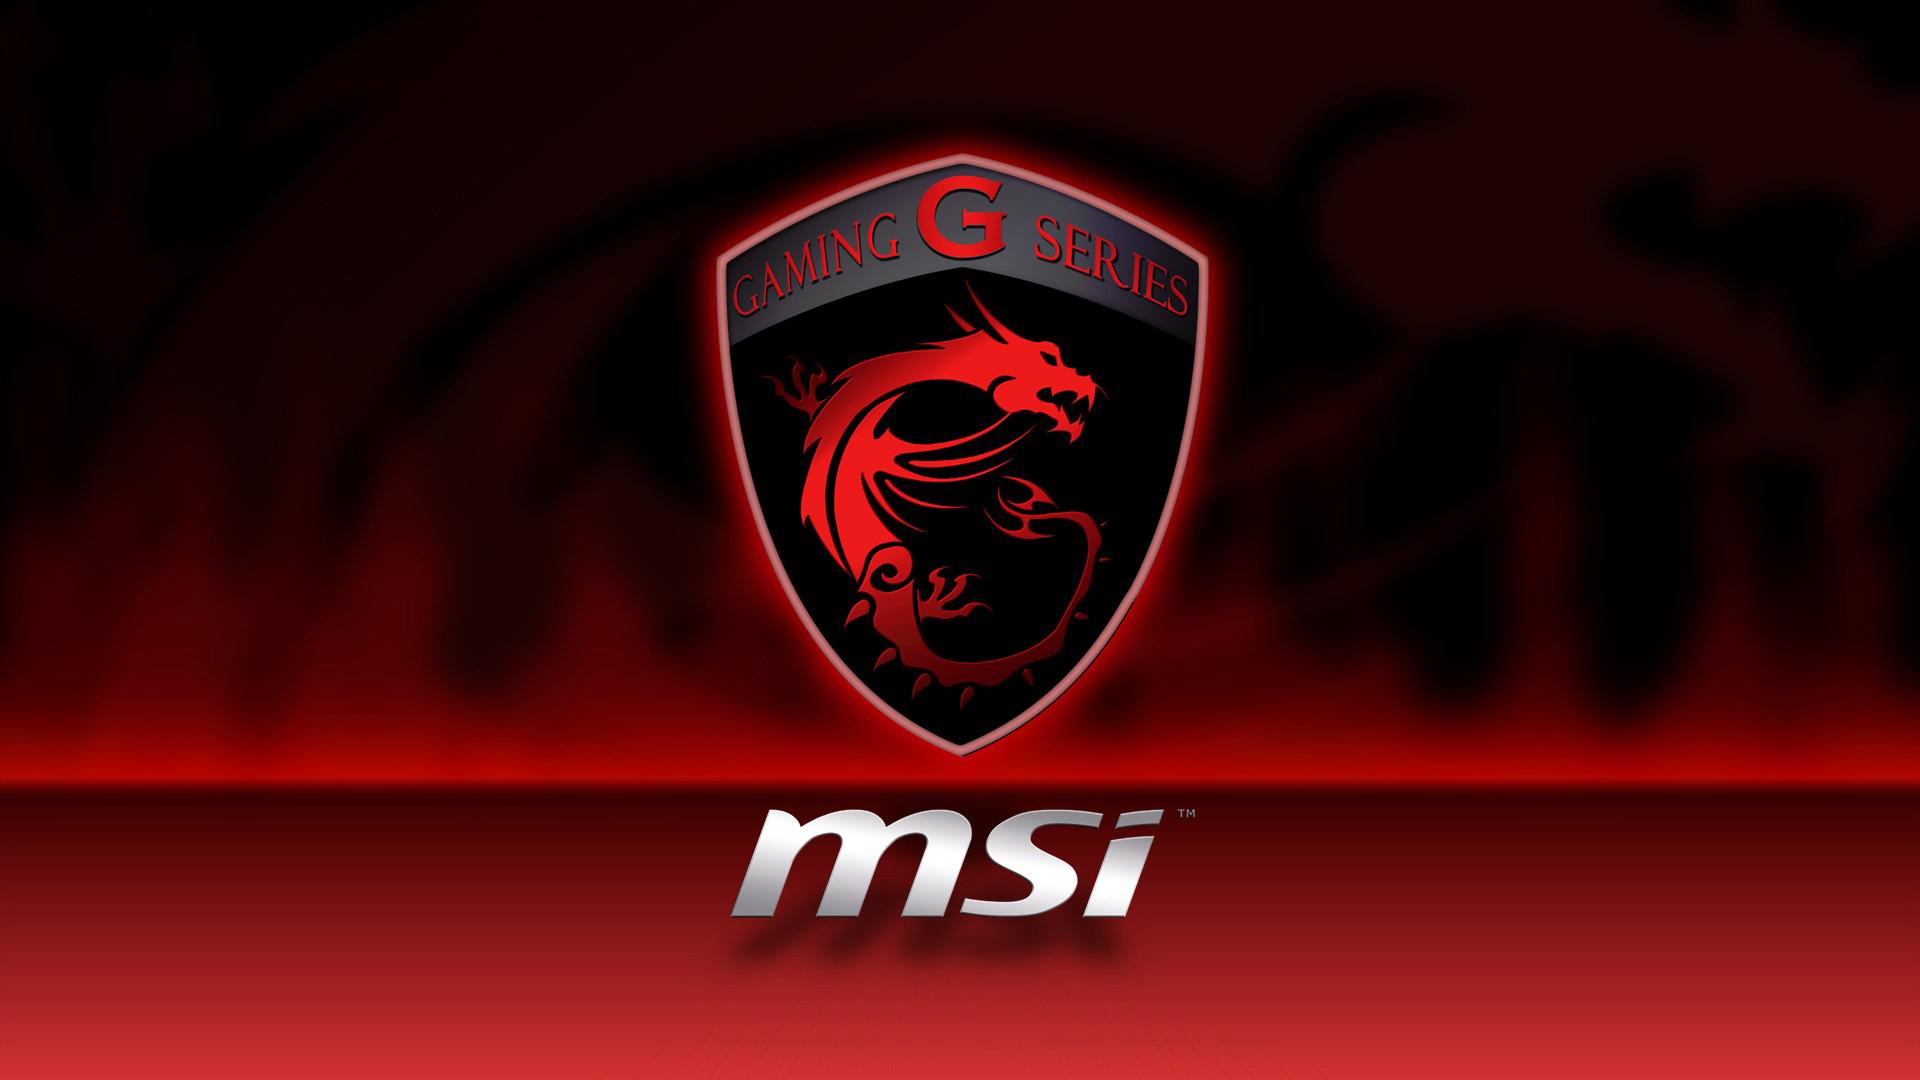 msi gaming g series dragon logo hd 1920x1080 1080p wallpaper 1920x1080